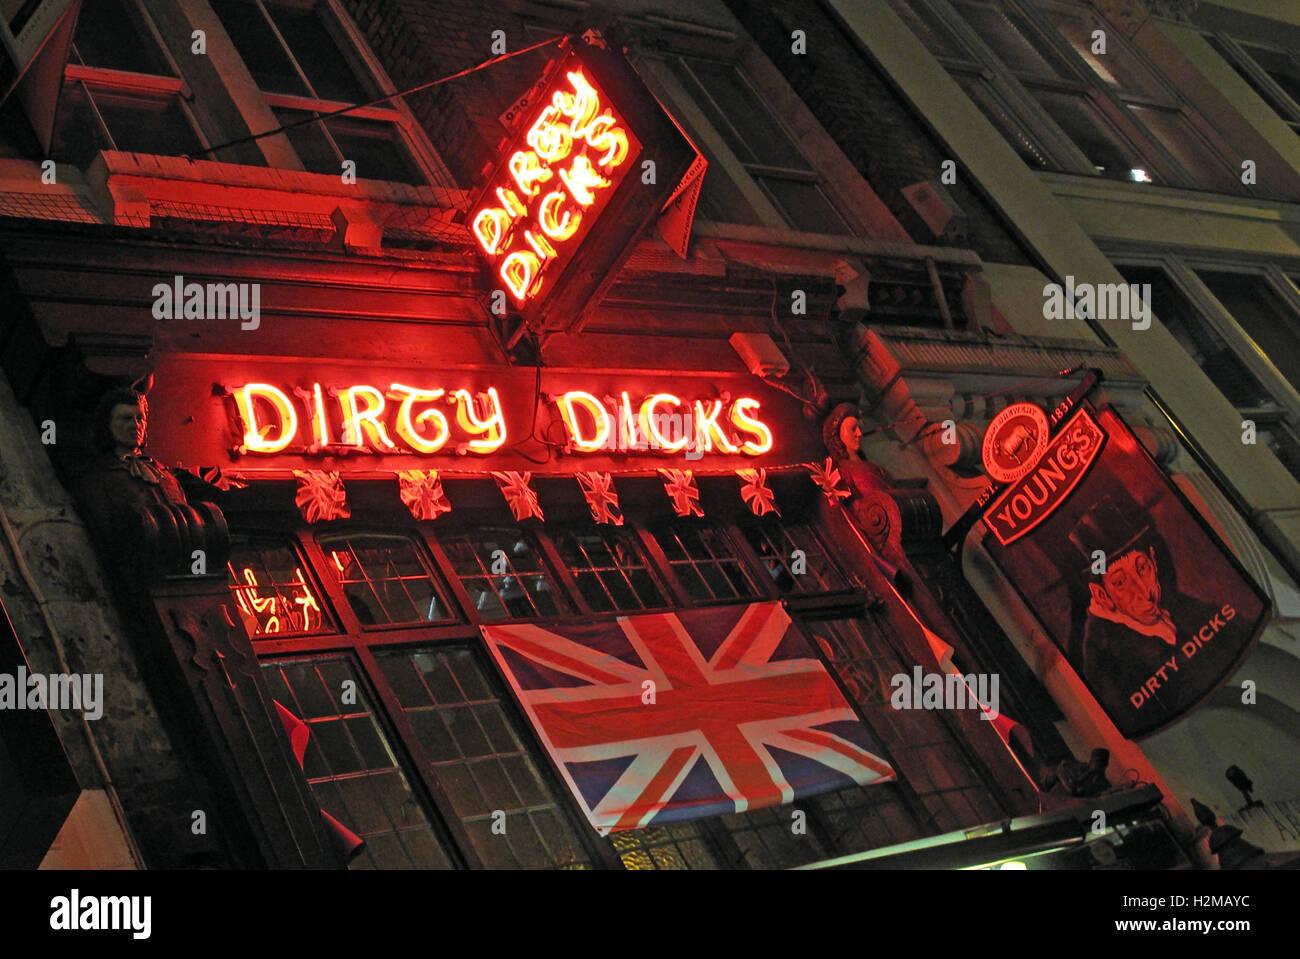 Dirty Dicks 18th Cent Pub, Liverpool Street/ Bishopsgate, London, UK - Stock Image